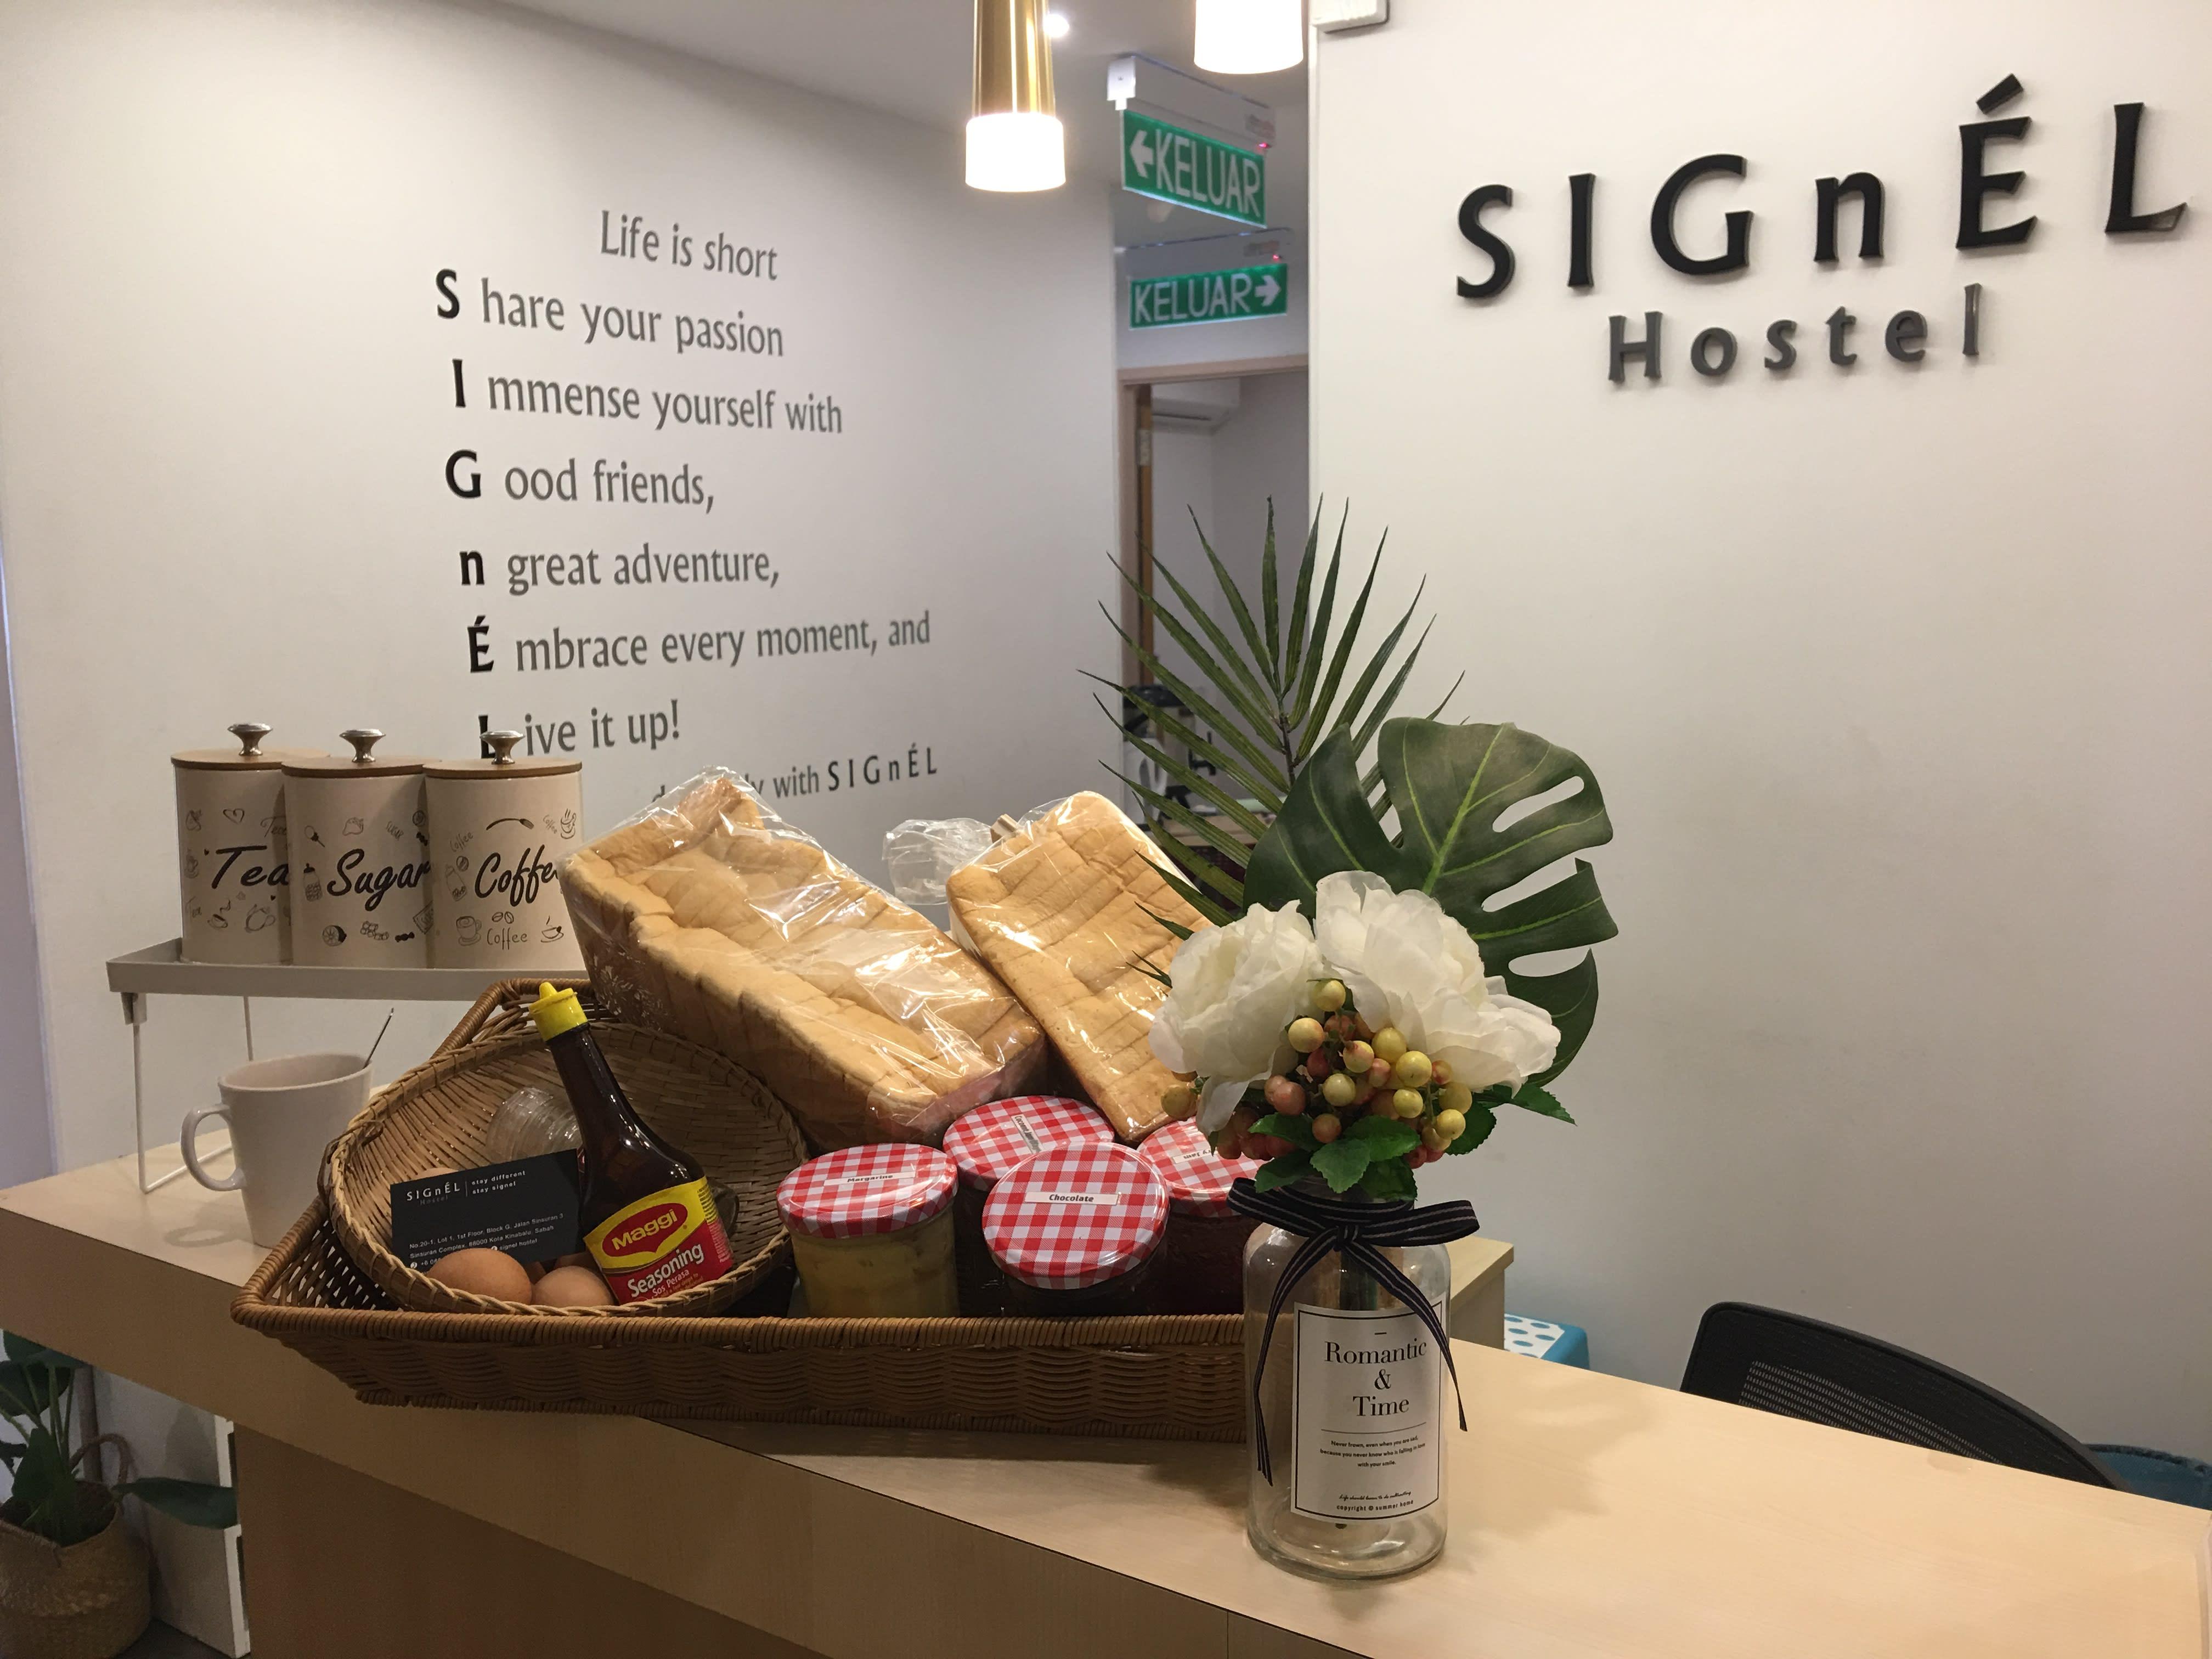 HOSTEL - Signel Hostel